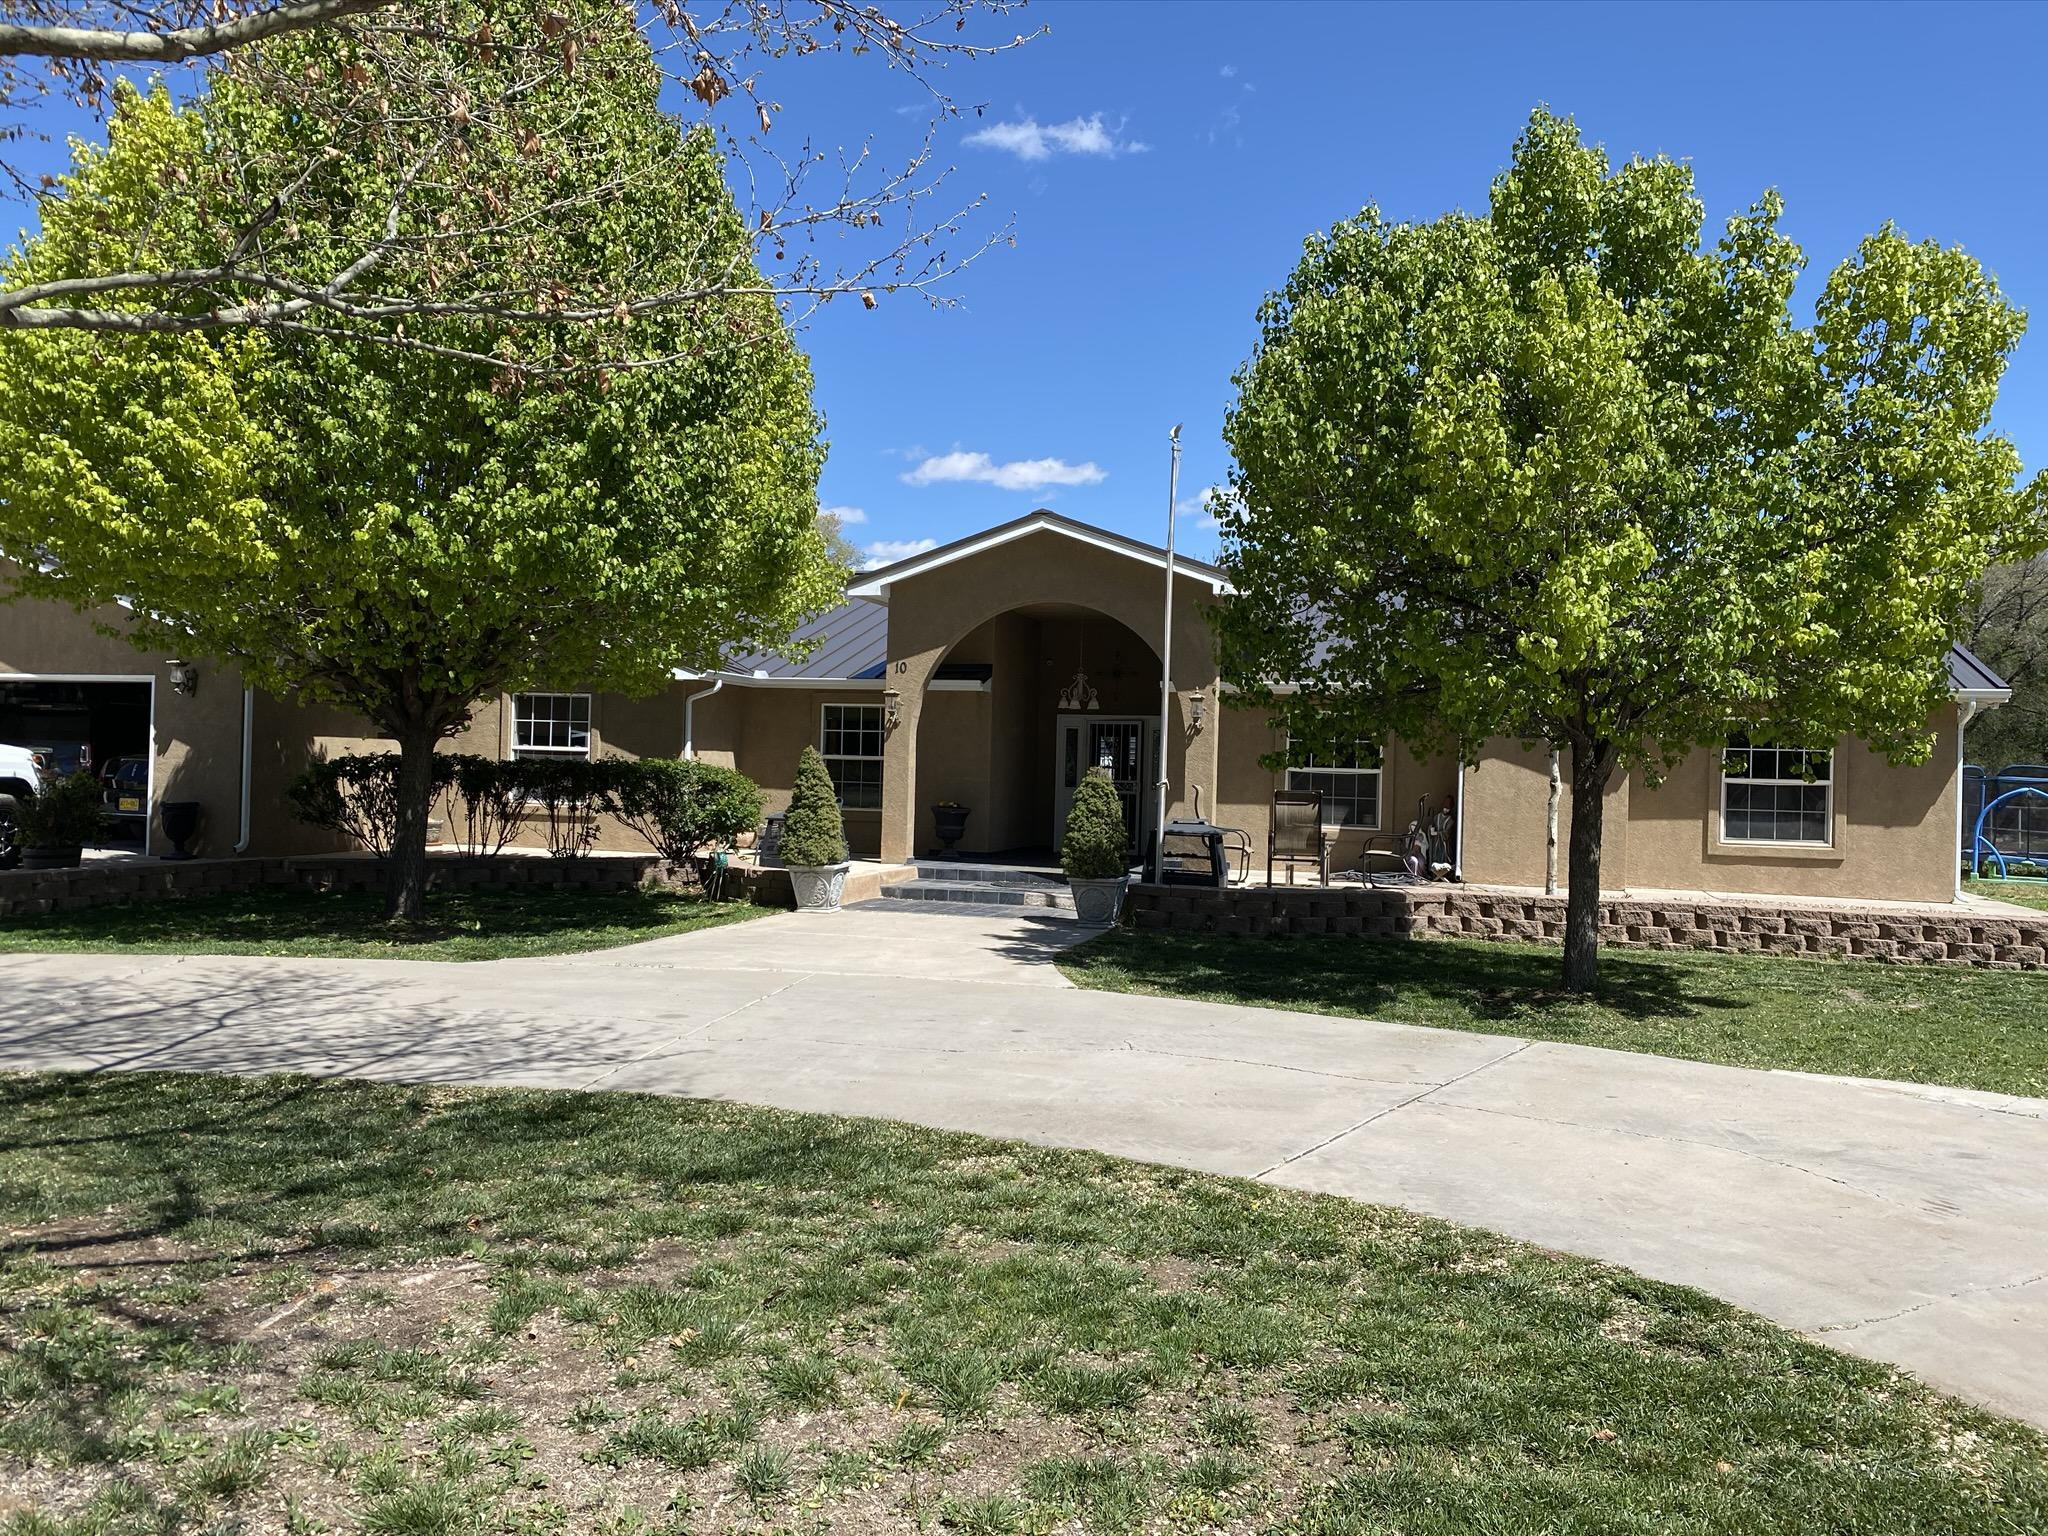 10 CAMINO DE FLORES, Peralta, NM 87042 - Peralta, NM real estate listing